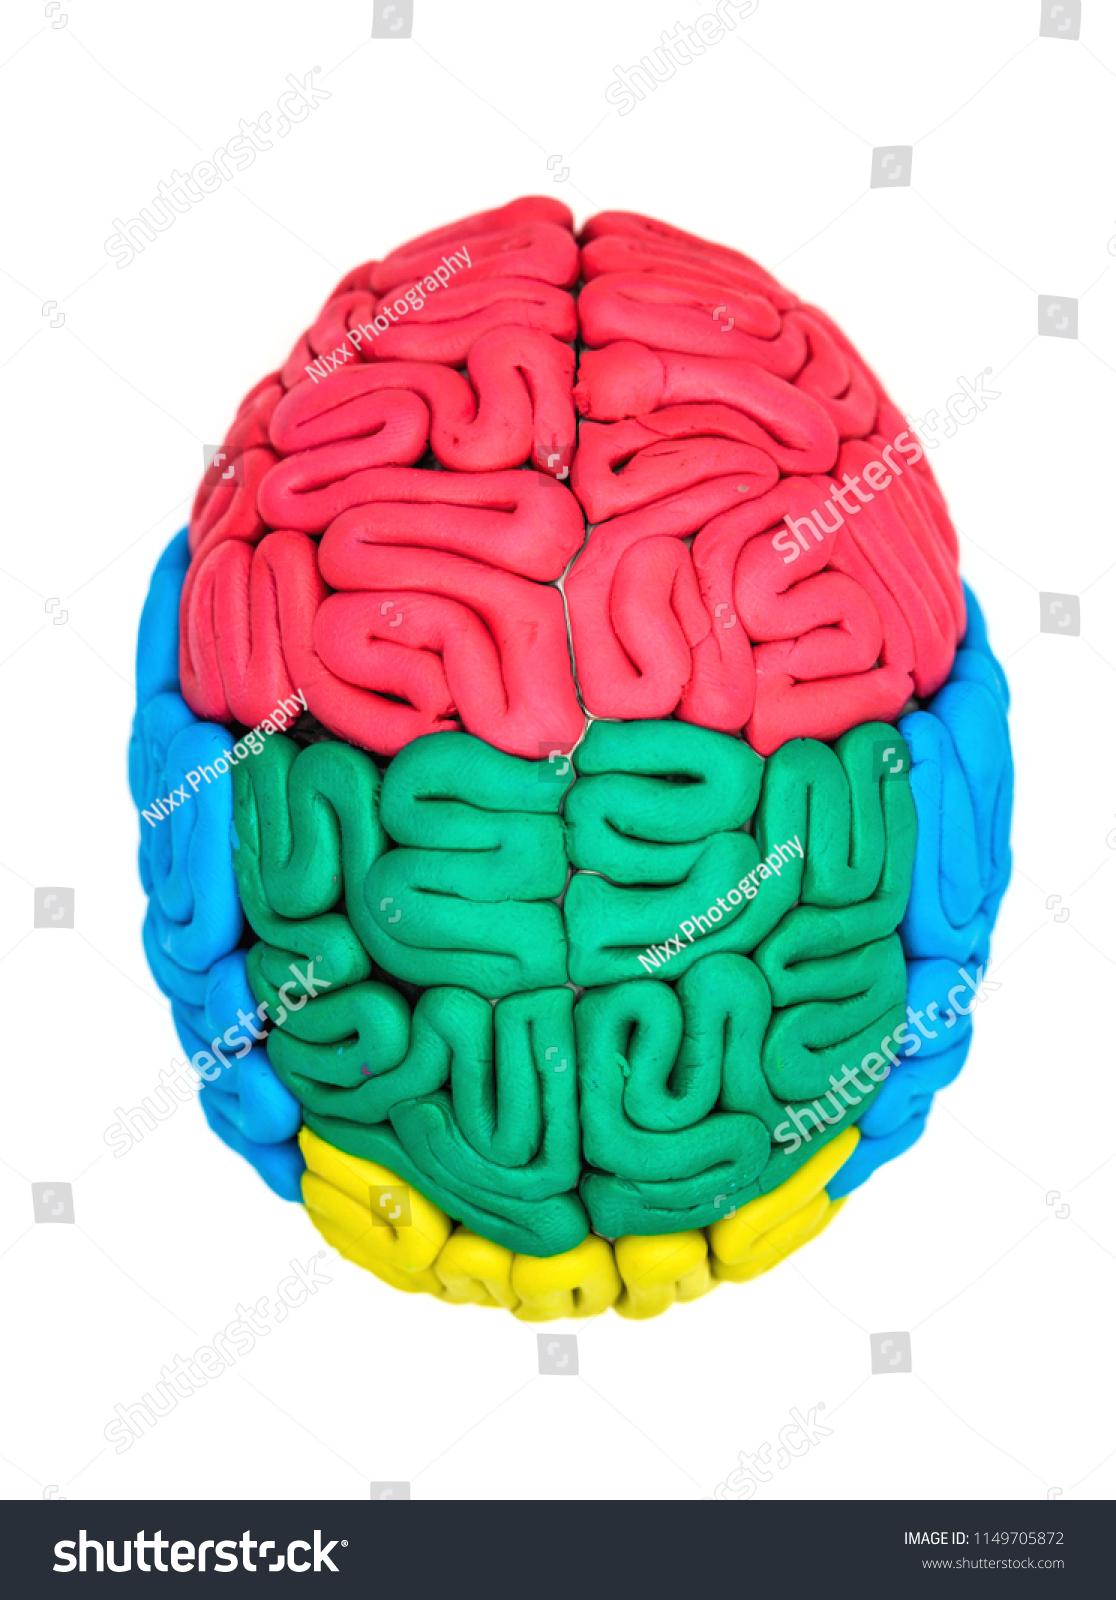 Clay Model Human Brain Anatomy On Stock Photo (Edit Now) 1149705872 ...